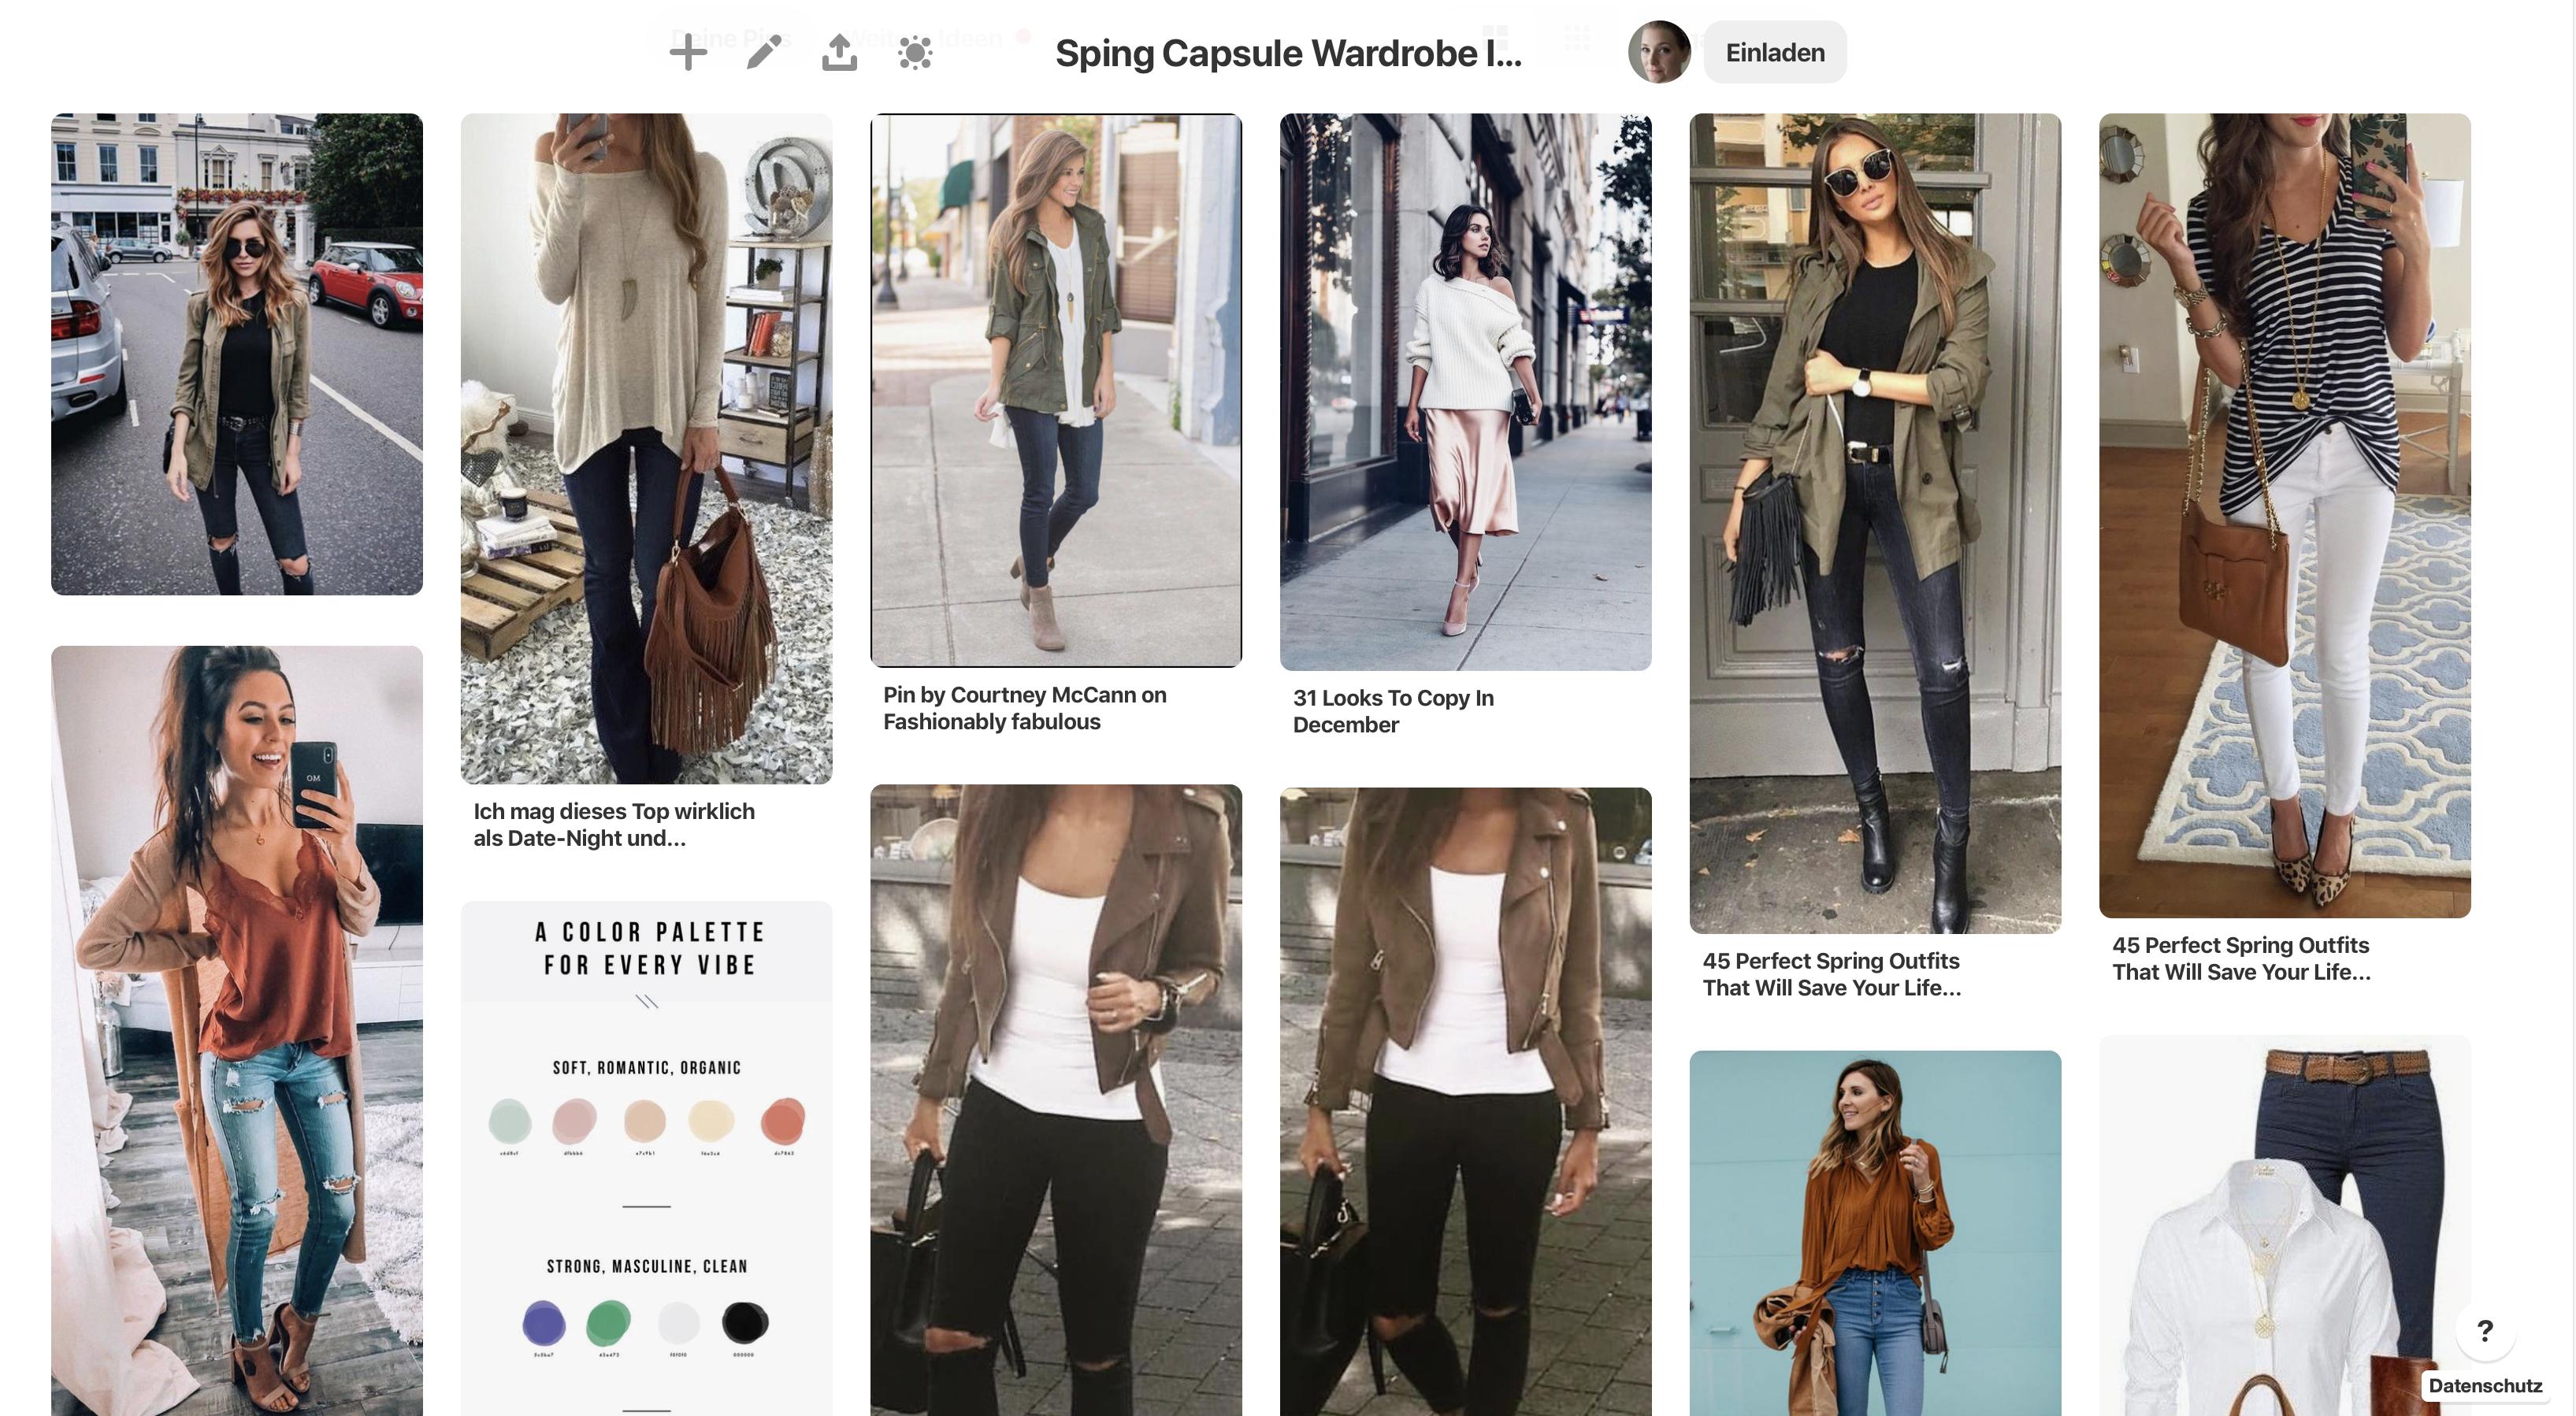 My Spring Capsule Wardrobe Pinterest Mood Board